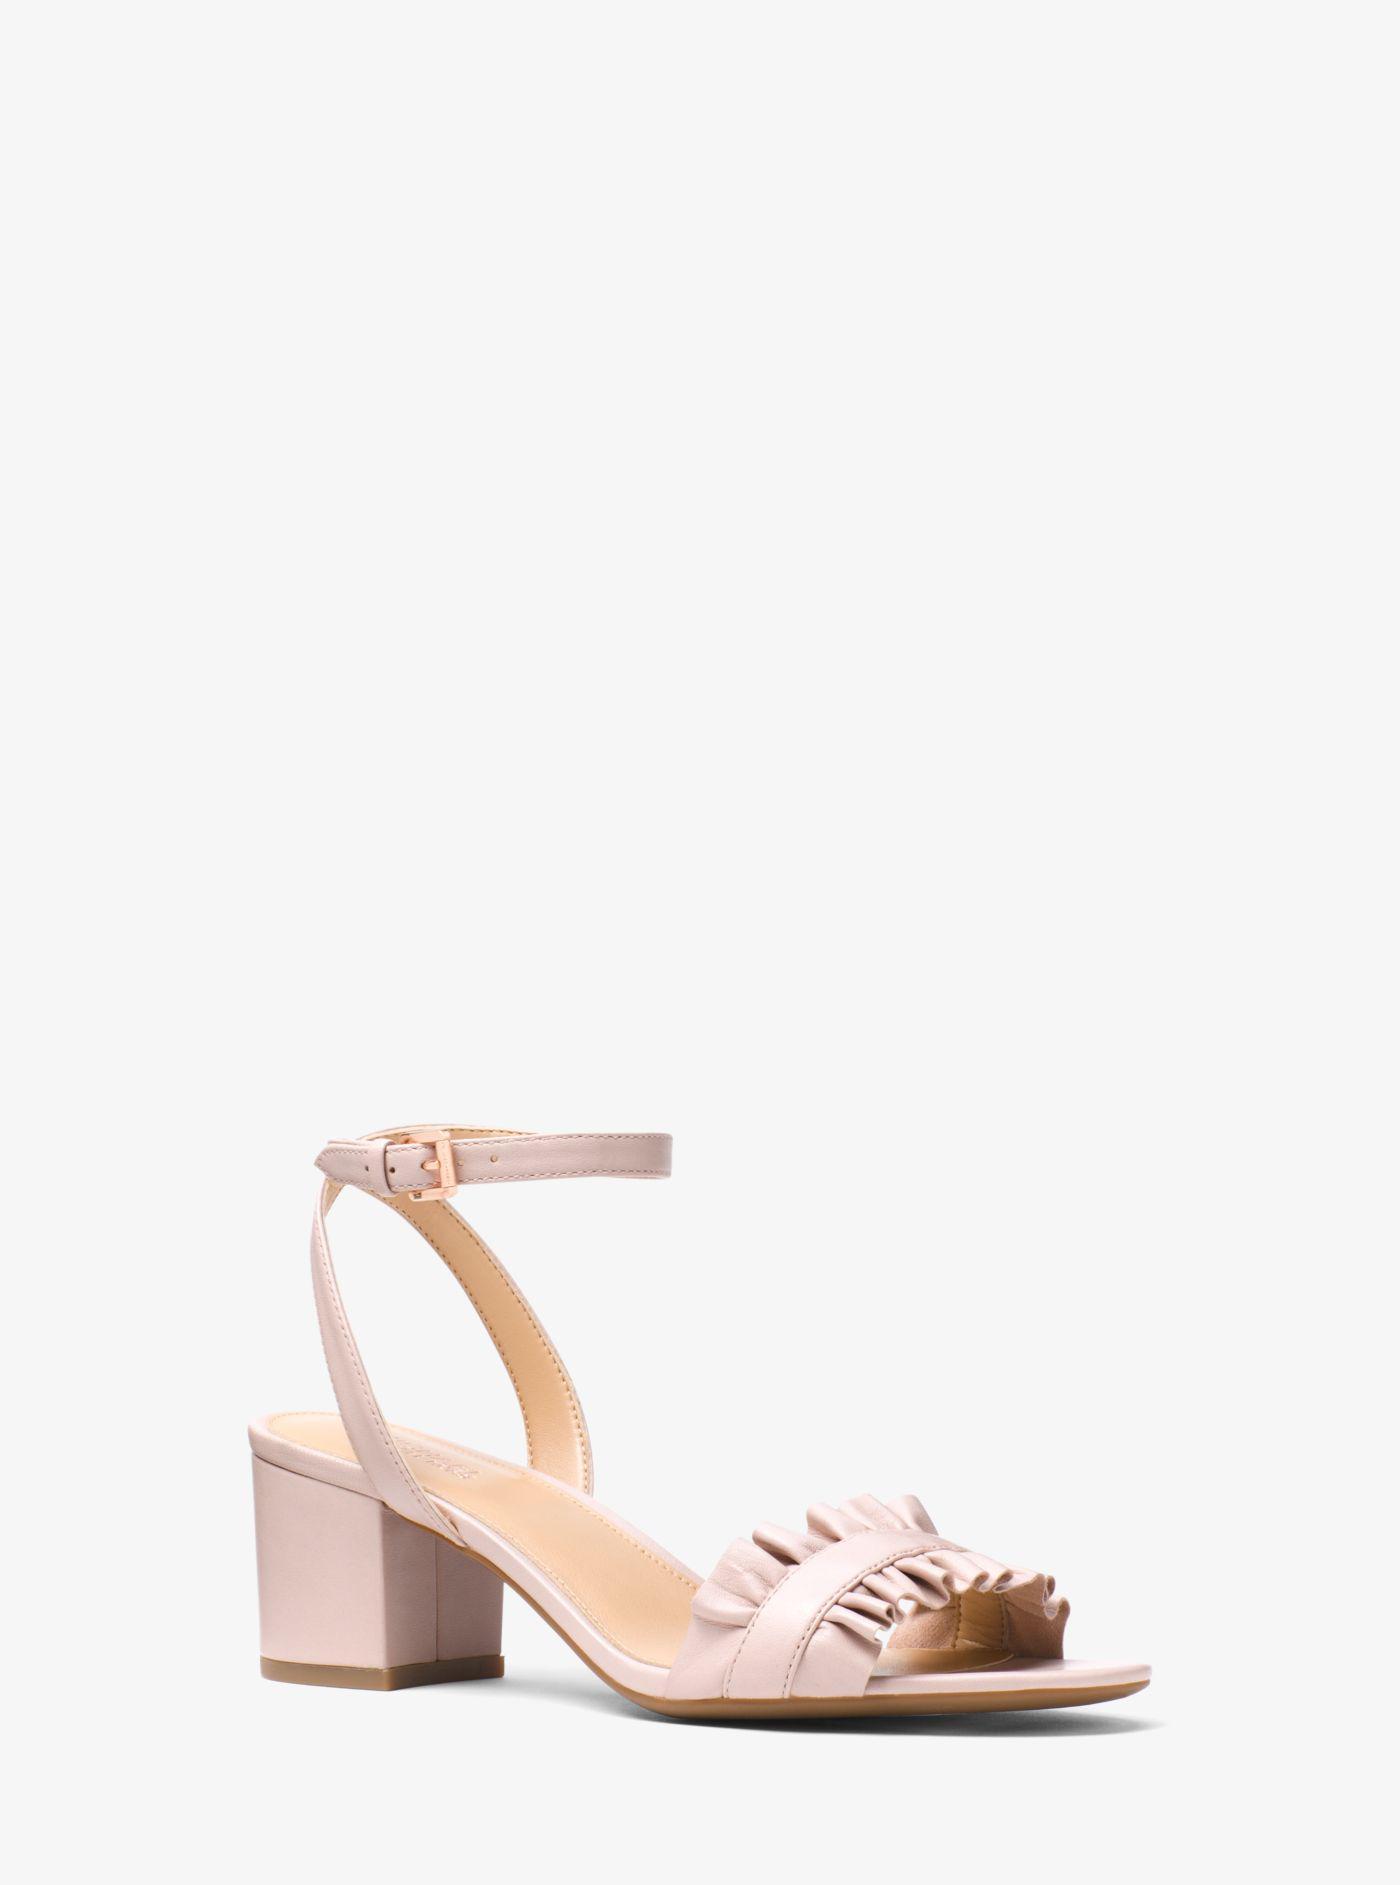 7918900c423 Michael Kors Pink Bella Ruffled Leather Sandal